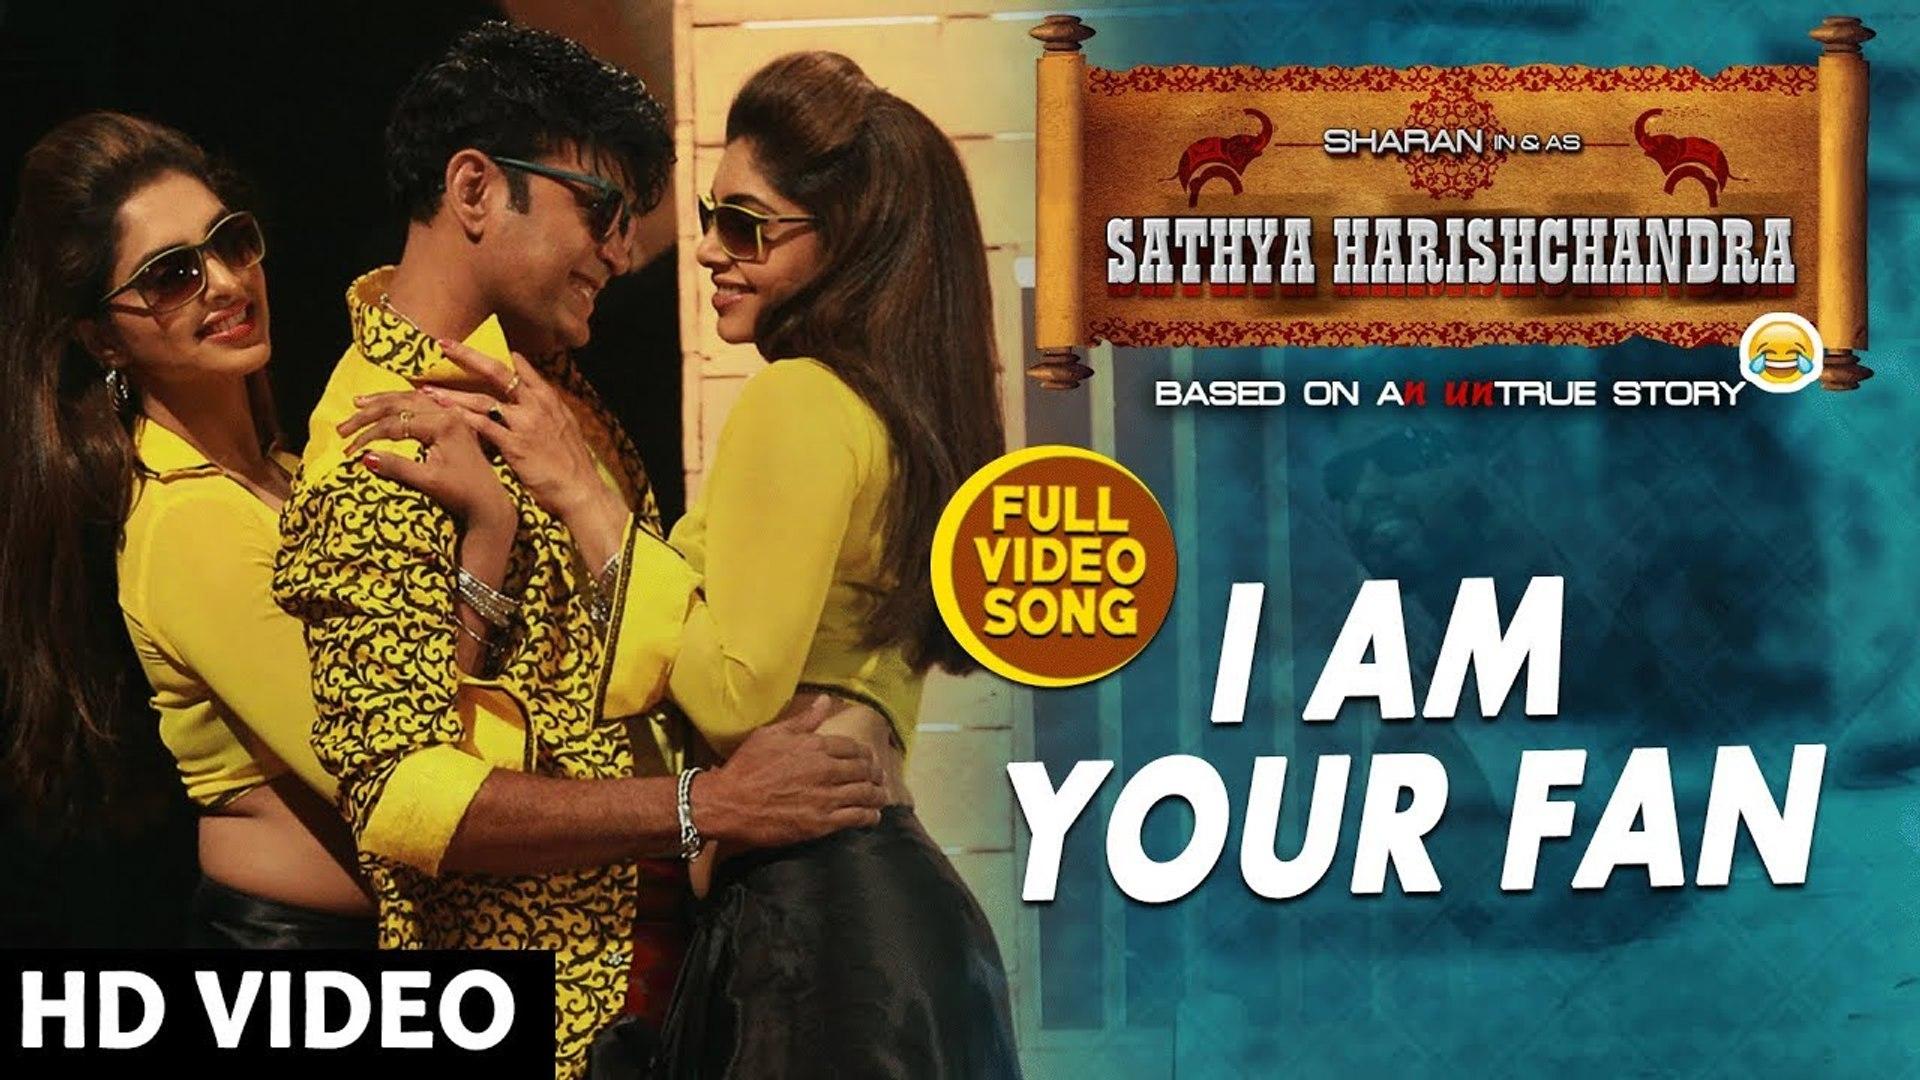 I Am Your Fan Full Video Song |Sathya Harishchandra Video Songs |Sharan, Bhavana Rao, Sanchitha